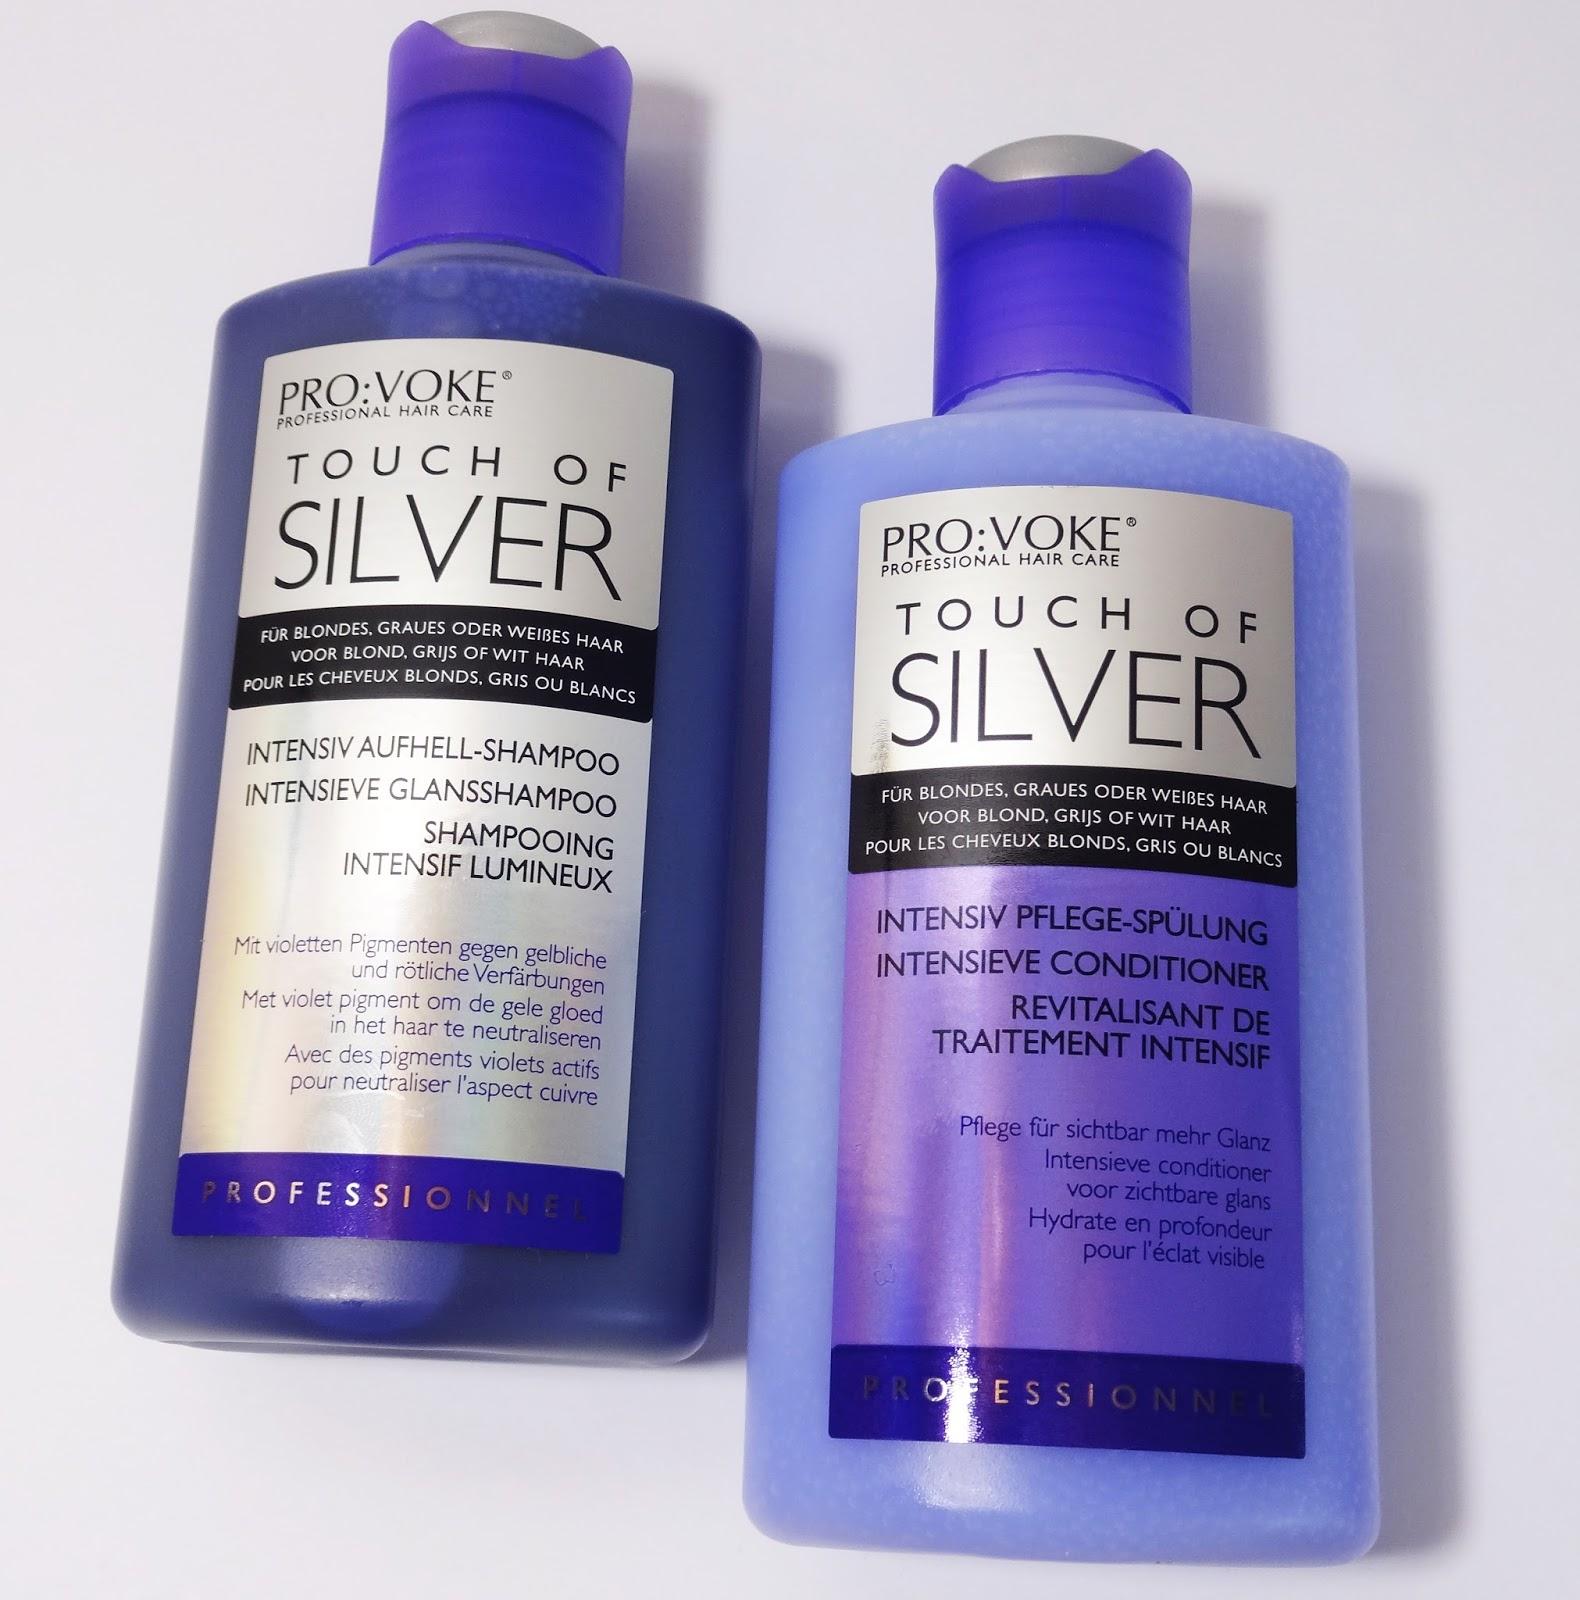 Pro:Voke - Touch of Silver - Intensiv Aufhell-Shampoo & Pflege-Spülung